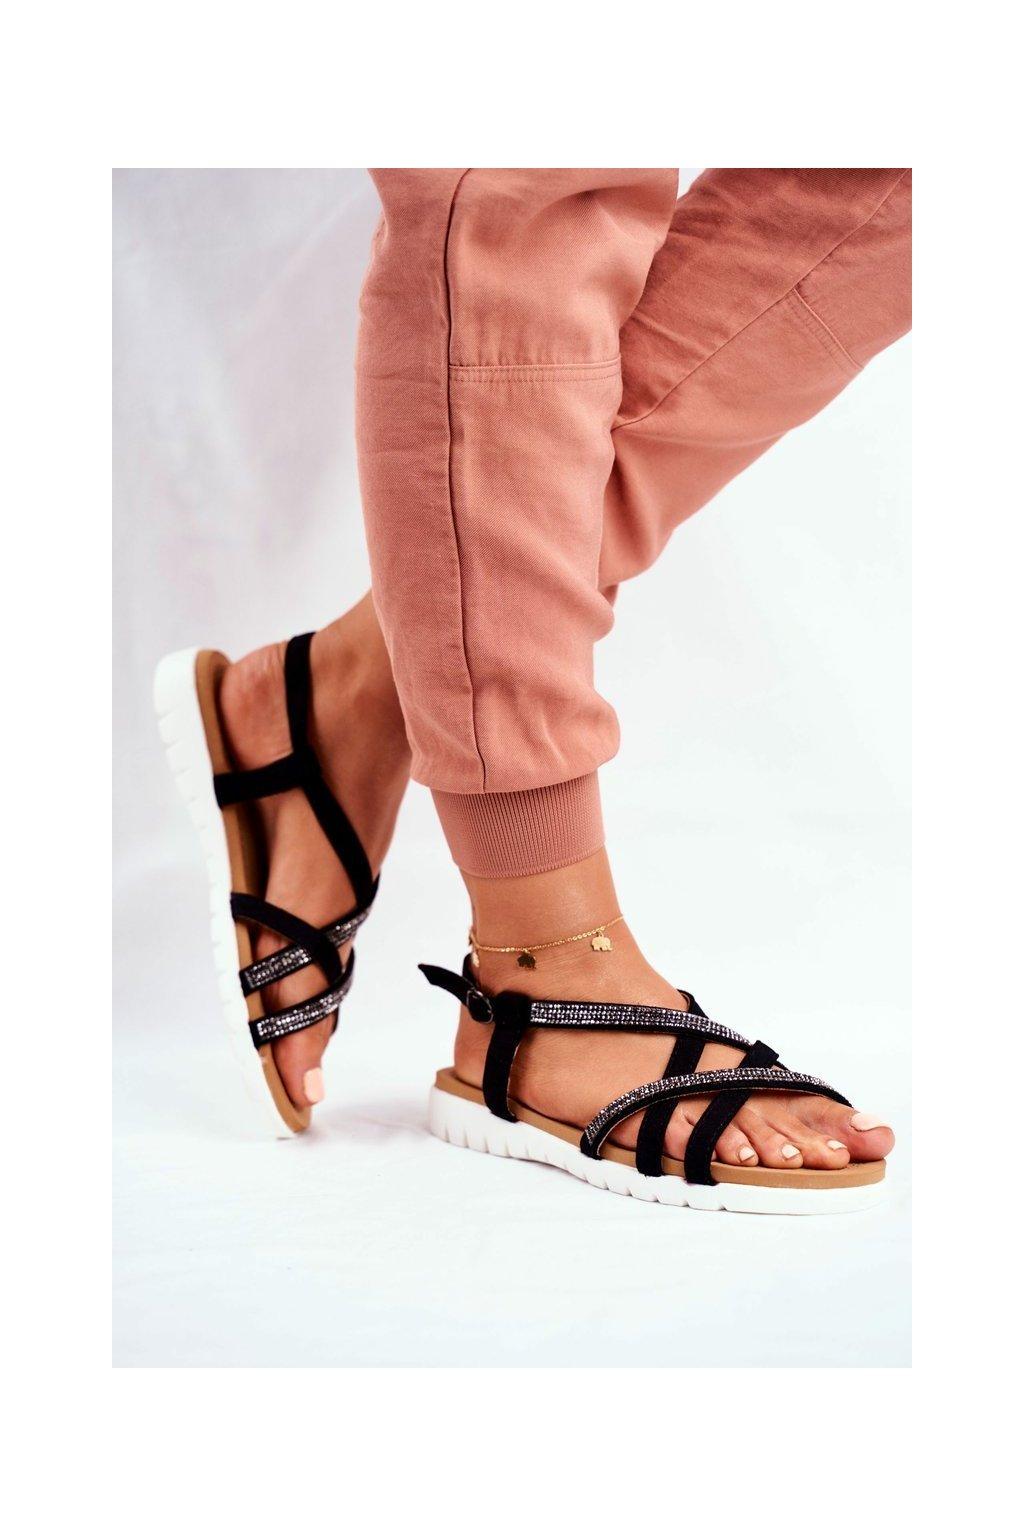 Dámske sandále s plochou podrážkou farba čierna kód obuvi 406-6 BLK